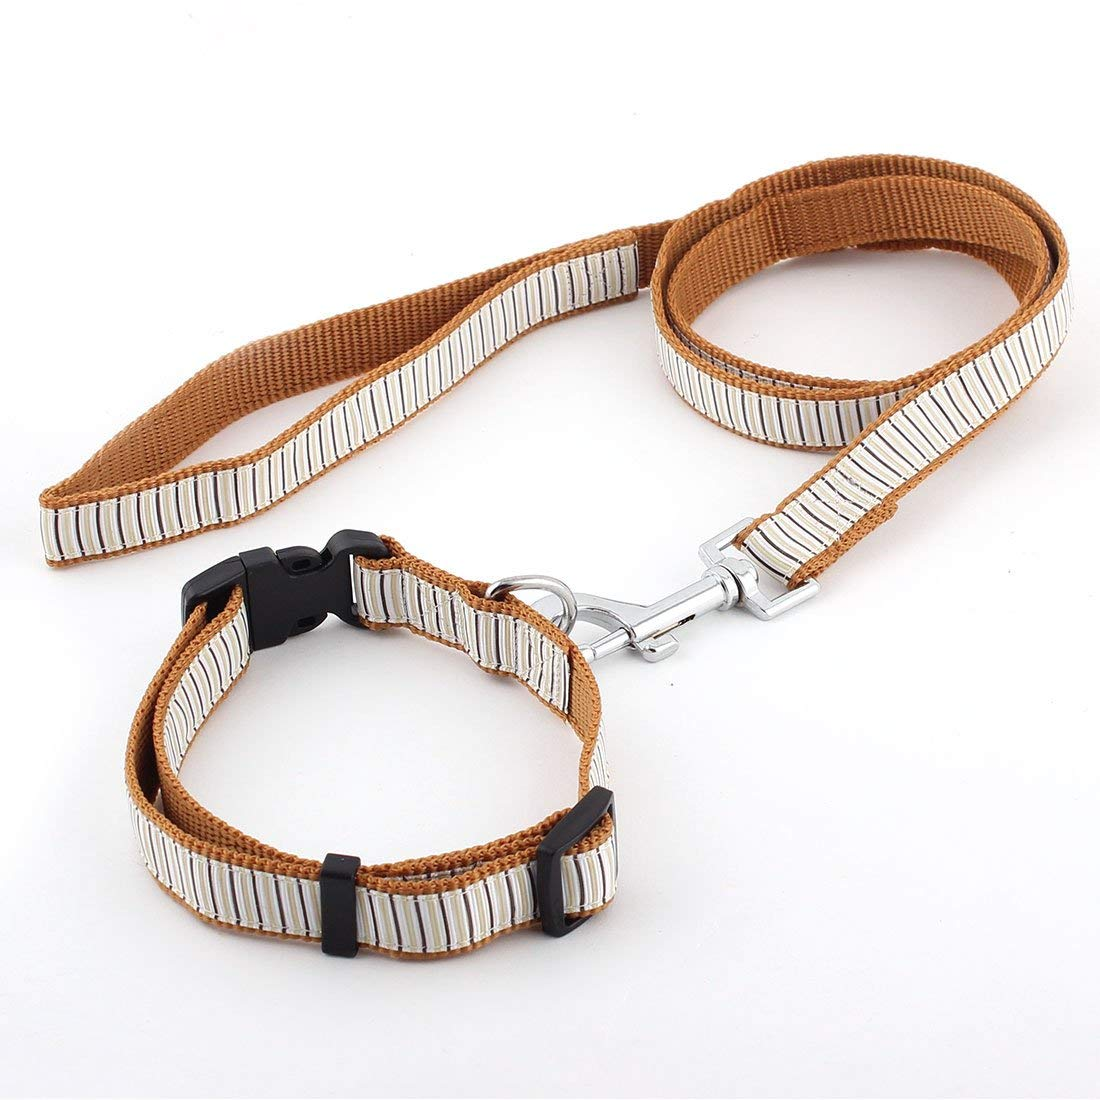 Nylon Pet Dog Round Rope Hook Type Durable Leash Strap Drawstring Sky bluee Red